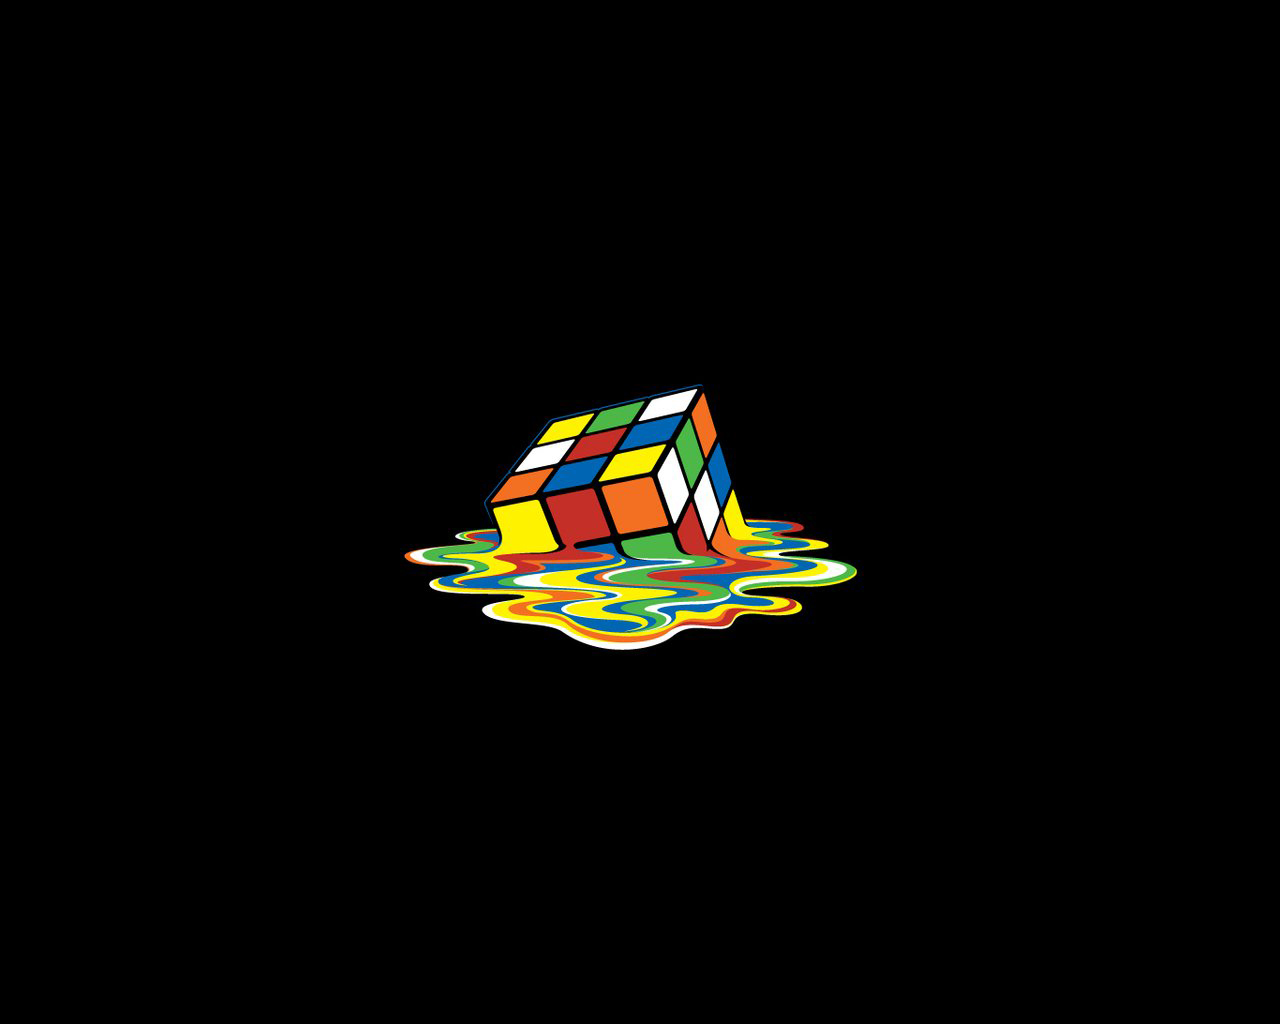 Rubiks Cube Wallpaper 1280x1024 Rubiks Cube 1280x1024